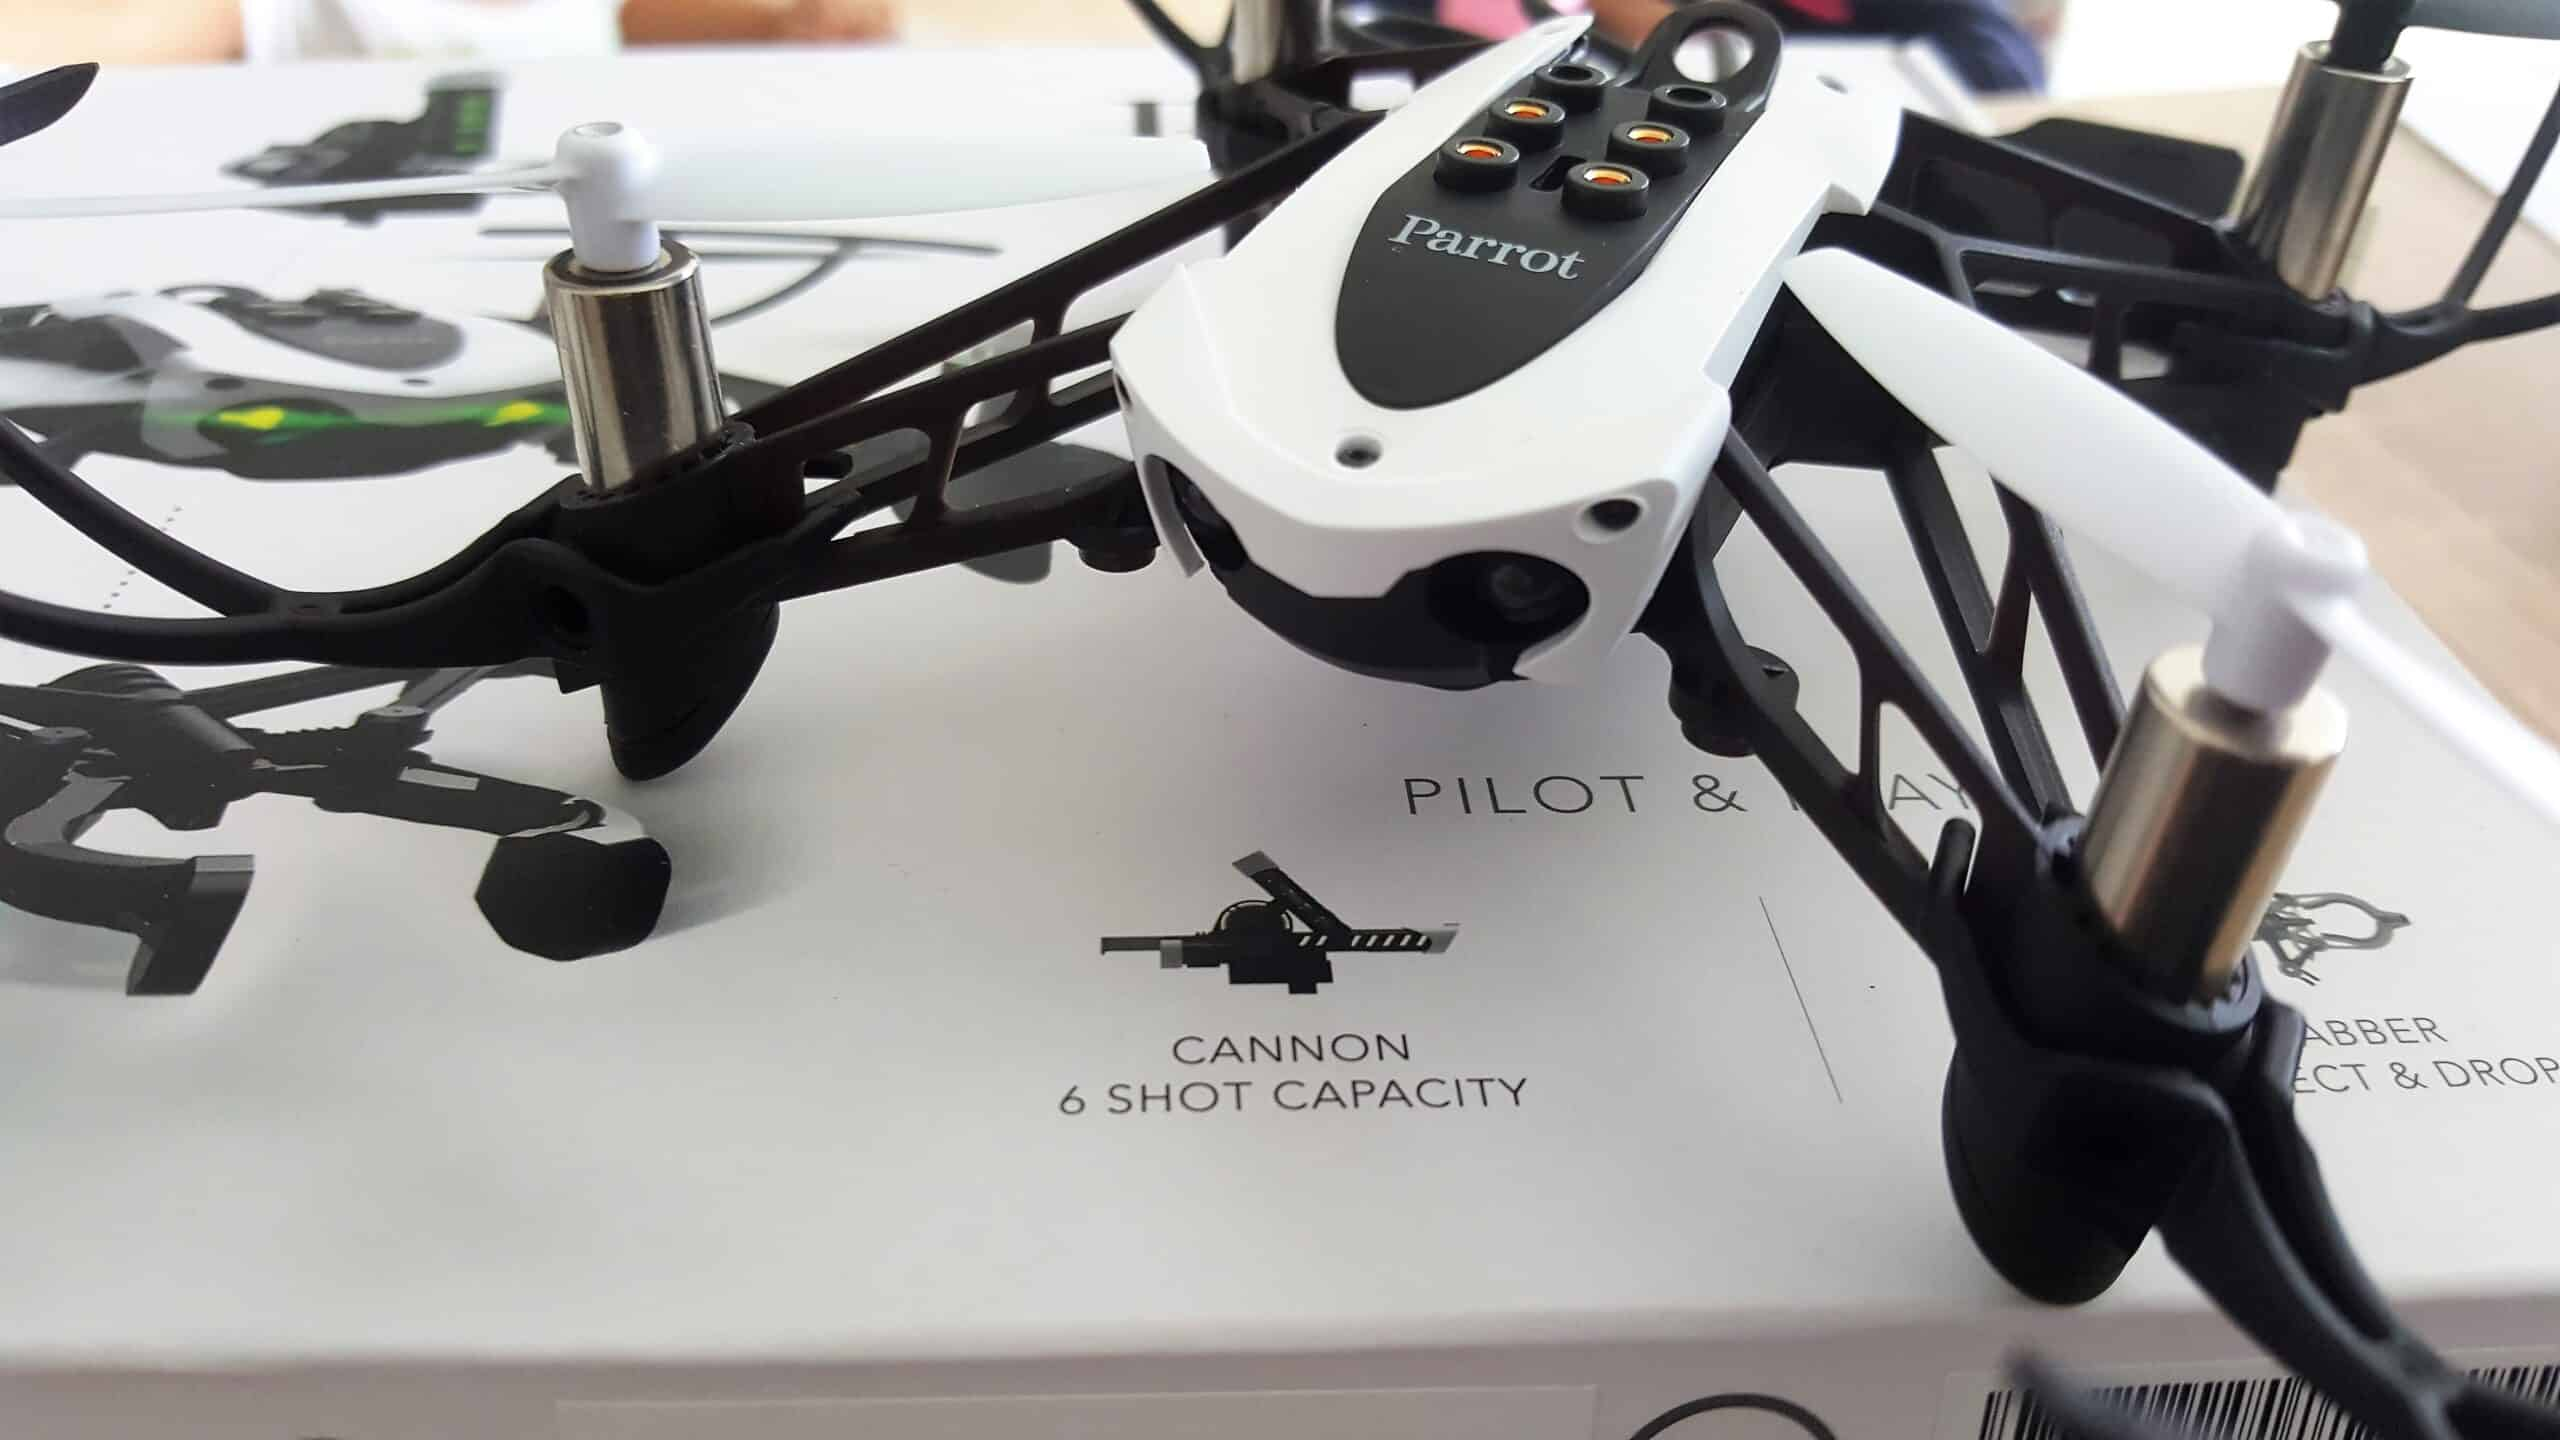 parrot mambo drone warehouseblueprint. Black Bedroom Furniture Sets. Home Design Ideas